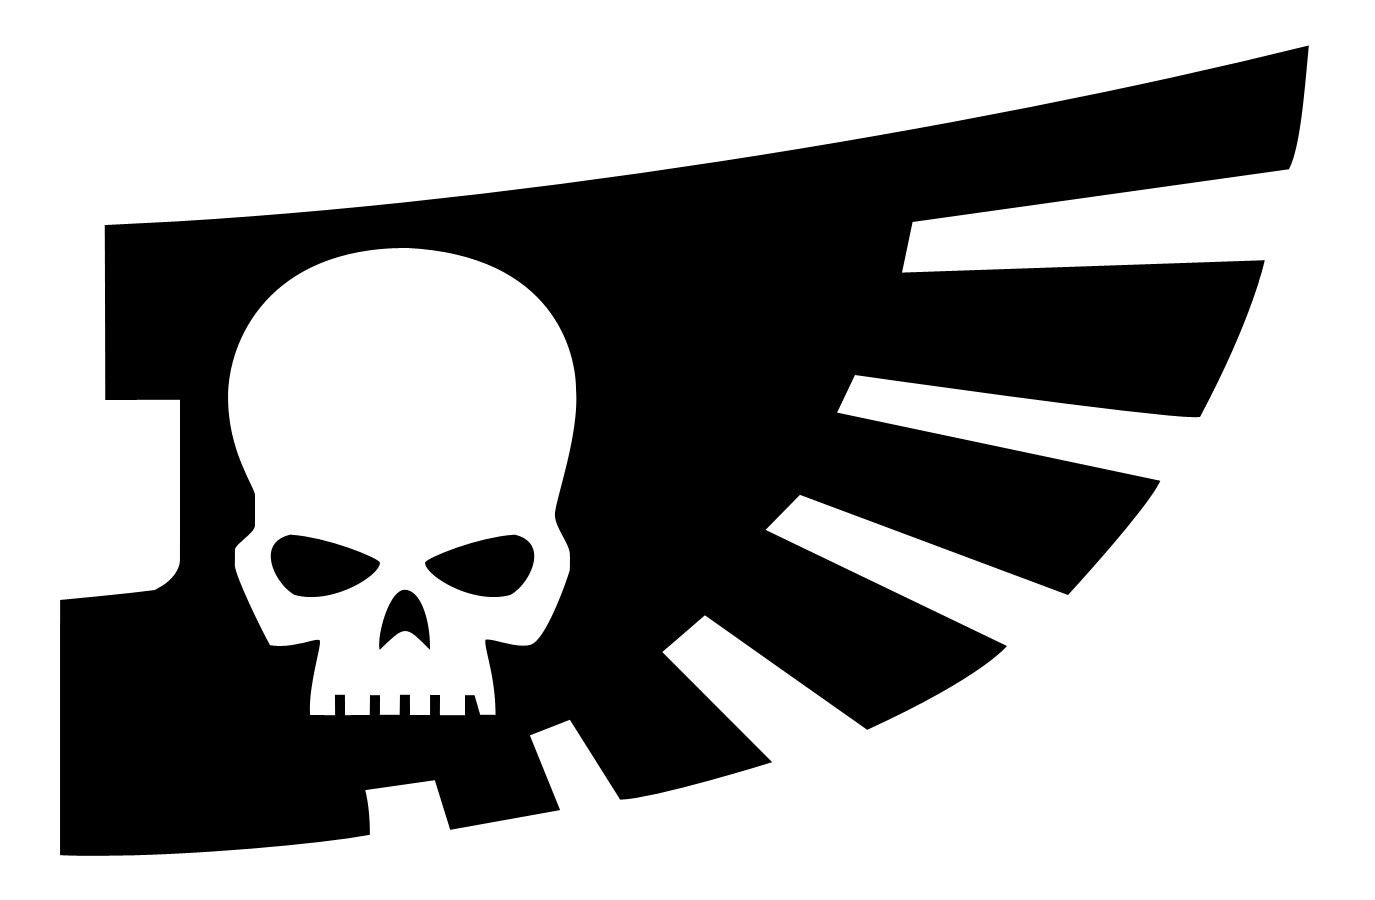 Warhammer clipart warhammer 40k Symbol a interested I of